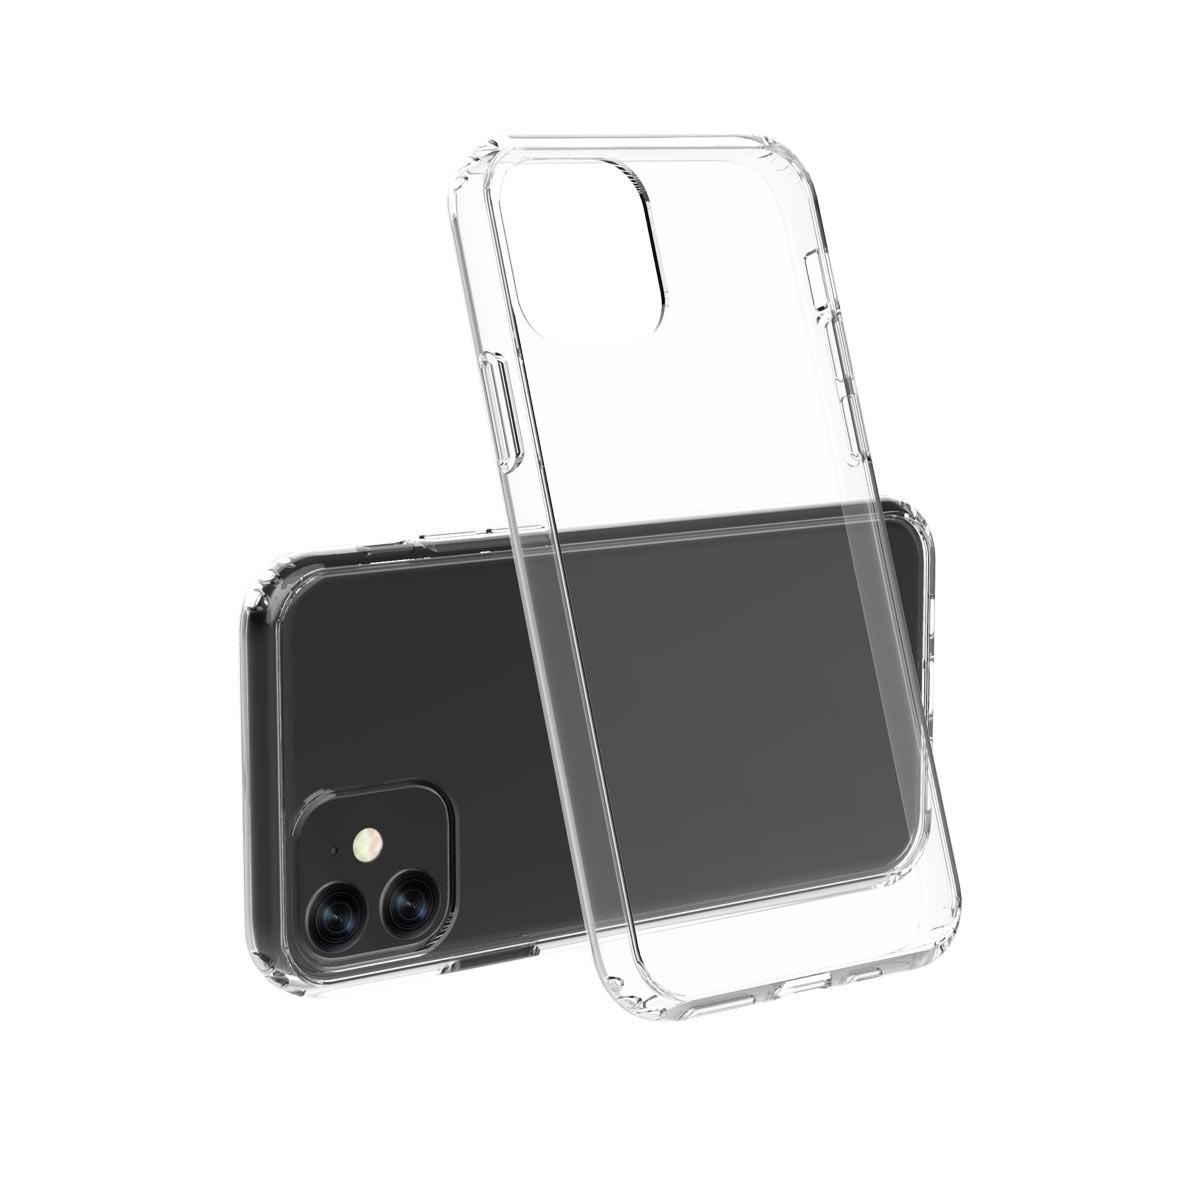 Capac protectie spate cellara colectia crystal pentru iphone 11 - transparent